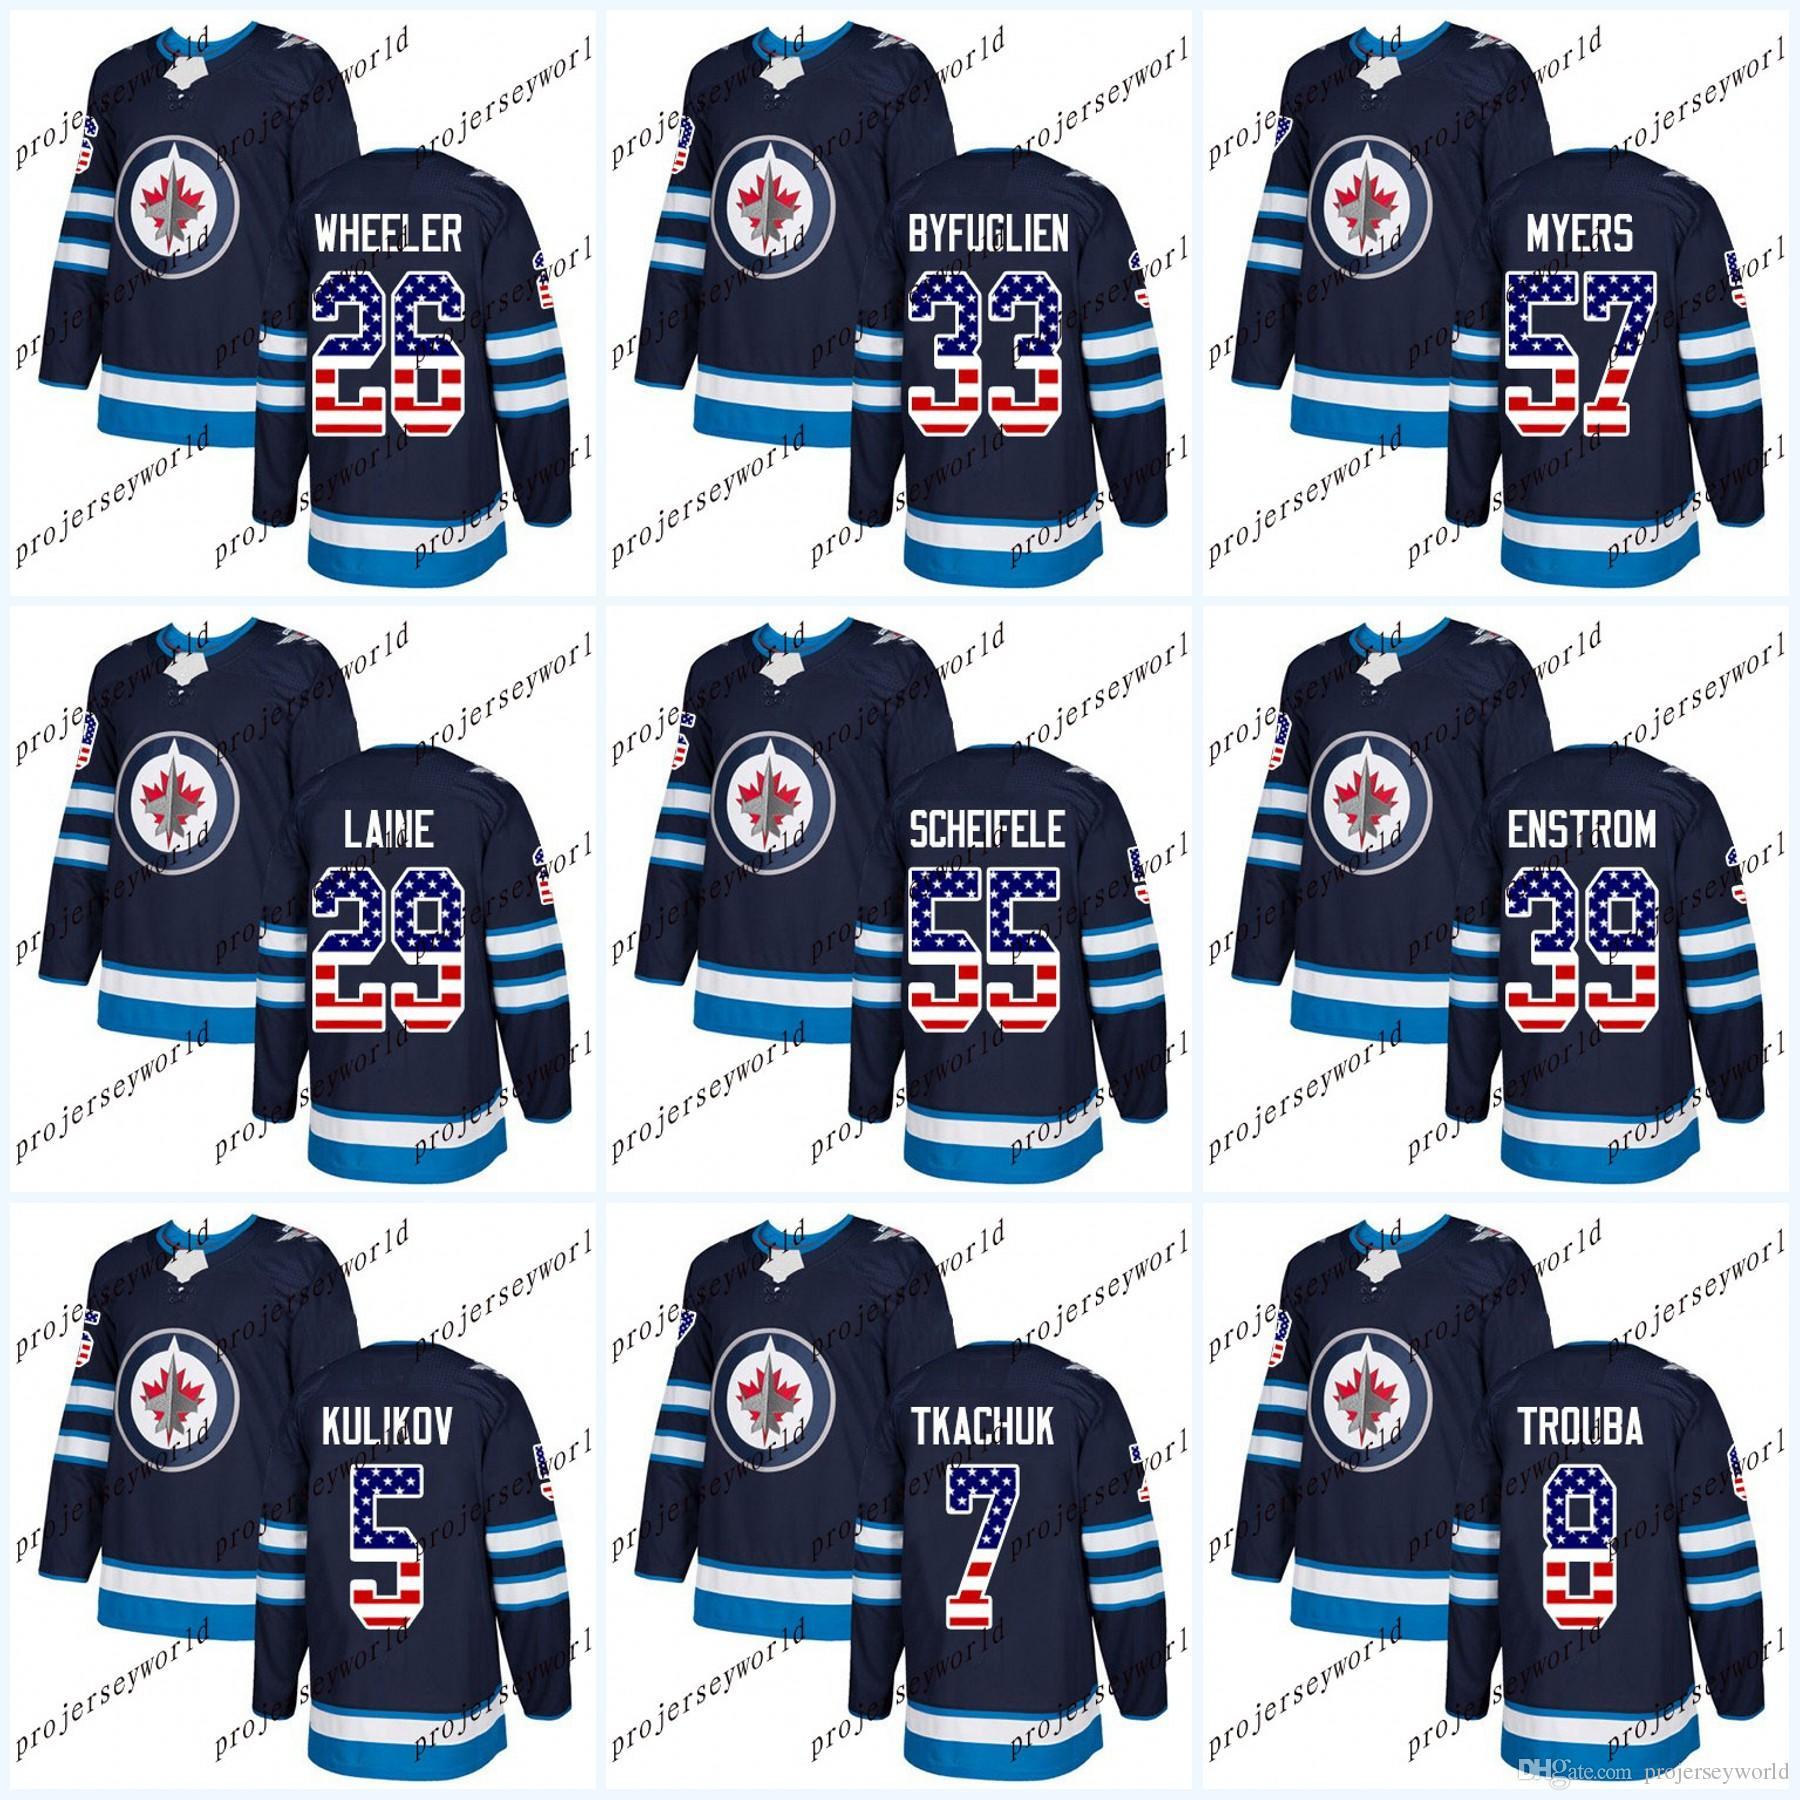 7594ef1dee4 ... 55 mark scheifele white hockey hoodie jerseys patrik laine jersey hockey  jerse c9d25 3720b; wholesale cheap quebec nordiques jerseys best eagles  wentz ...